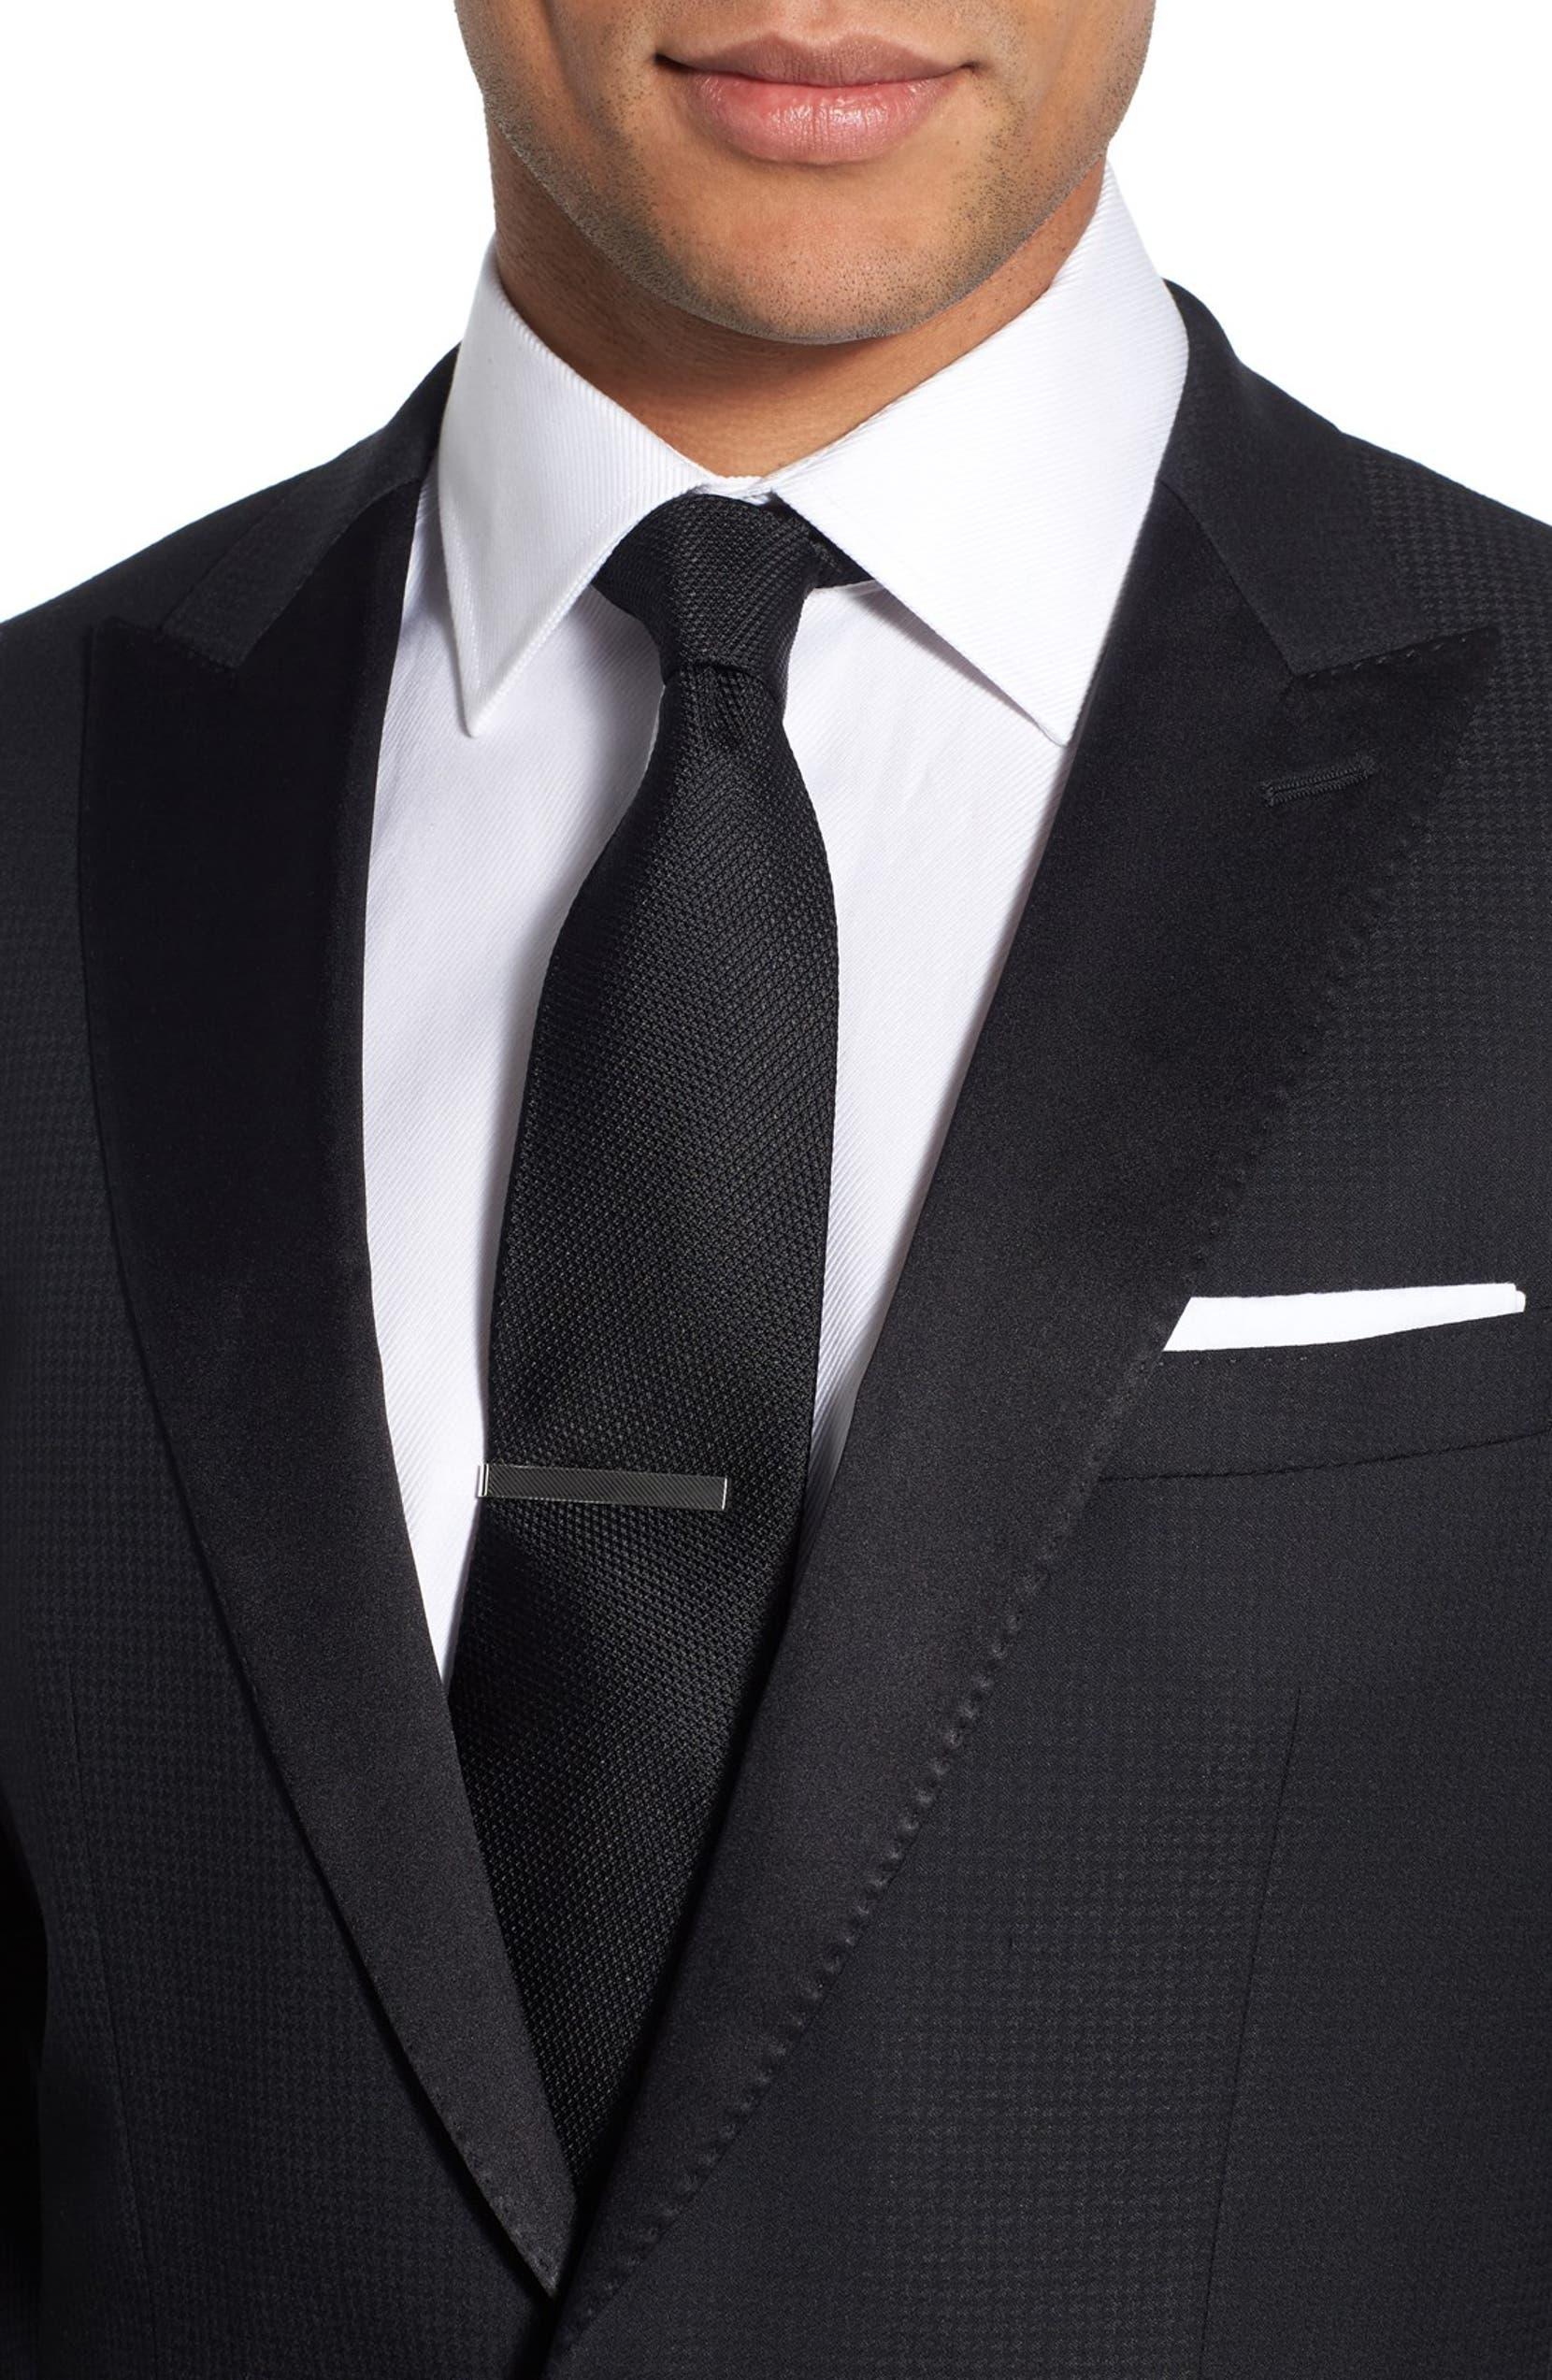 ad2e0dc5b BOSS 'Haimon' Trim Fit Wool Blend Dinner Jacket | Nordstrom